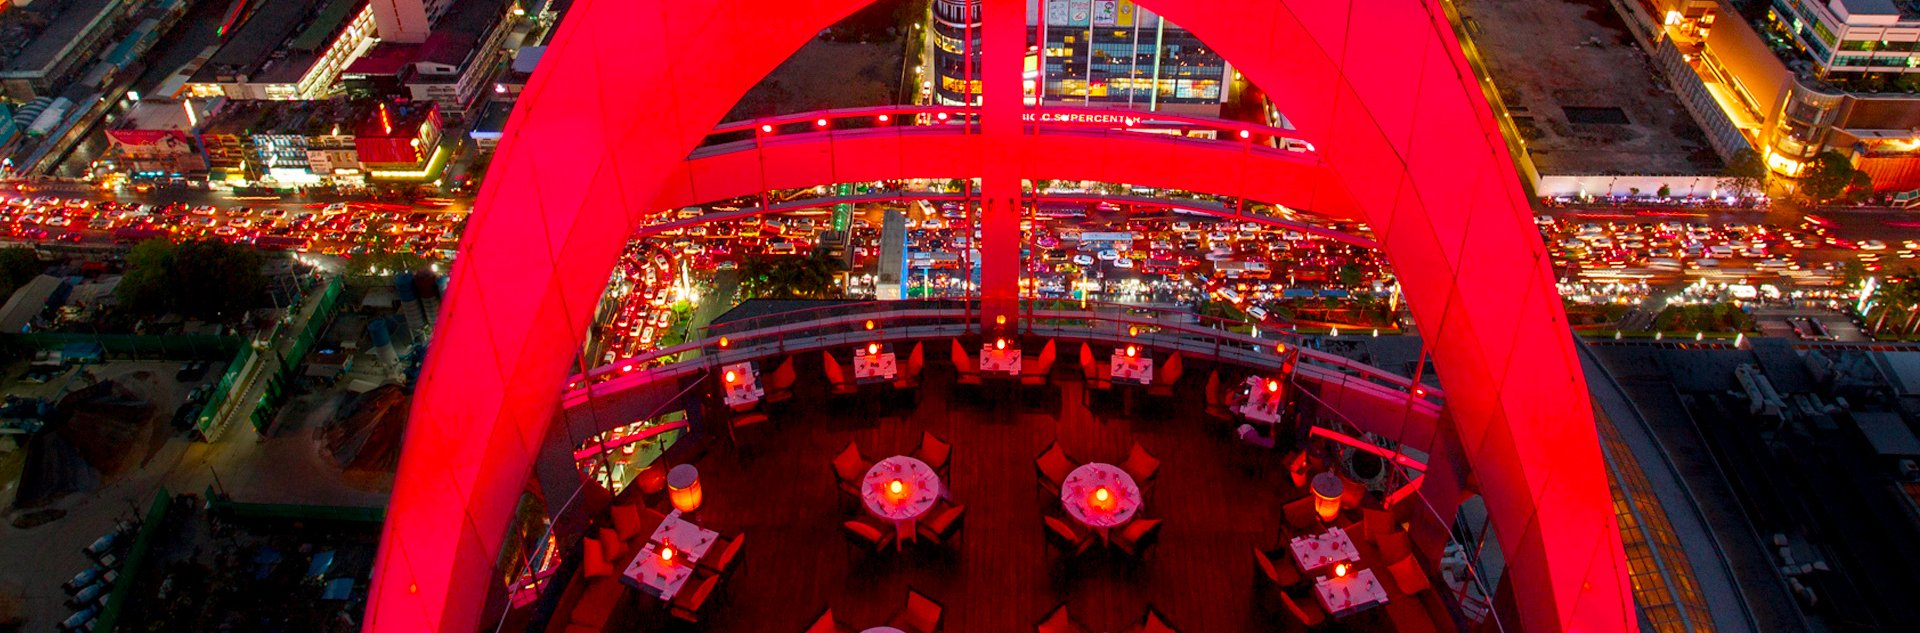 rooftop restaurant red sky à bangkok